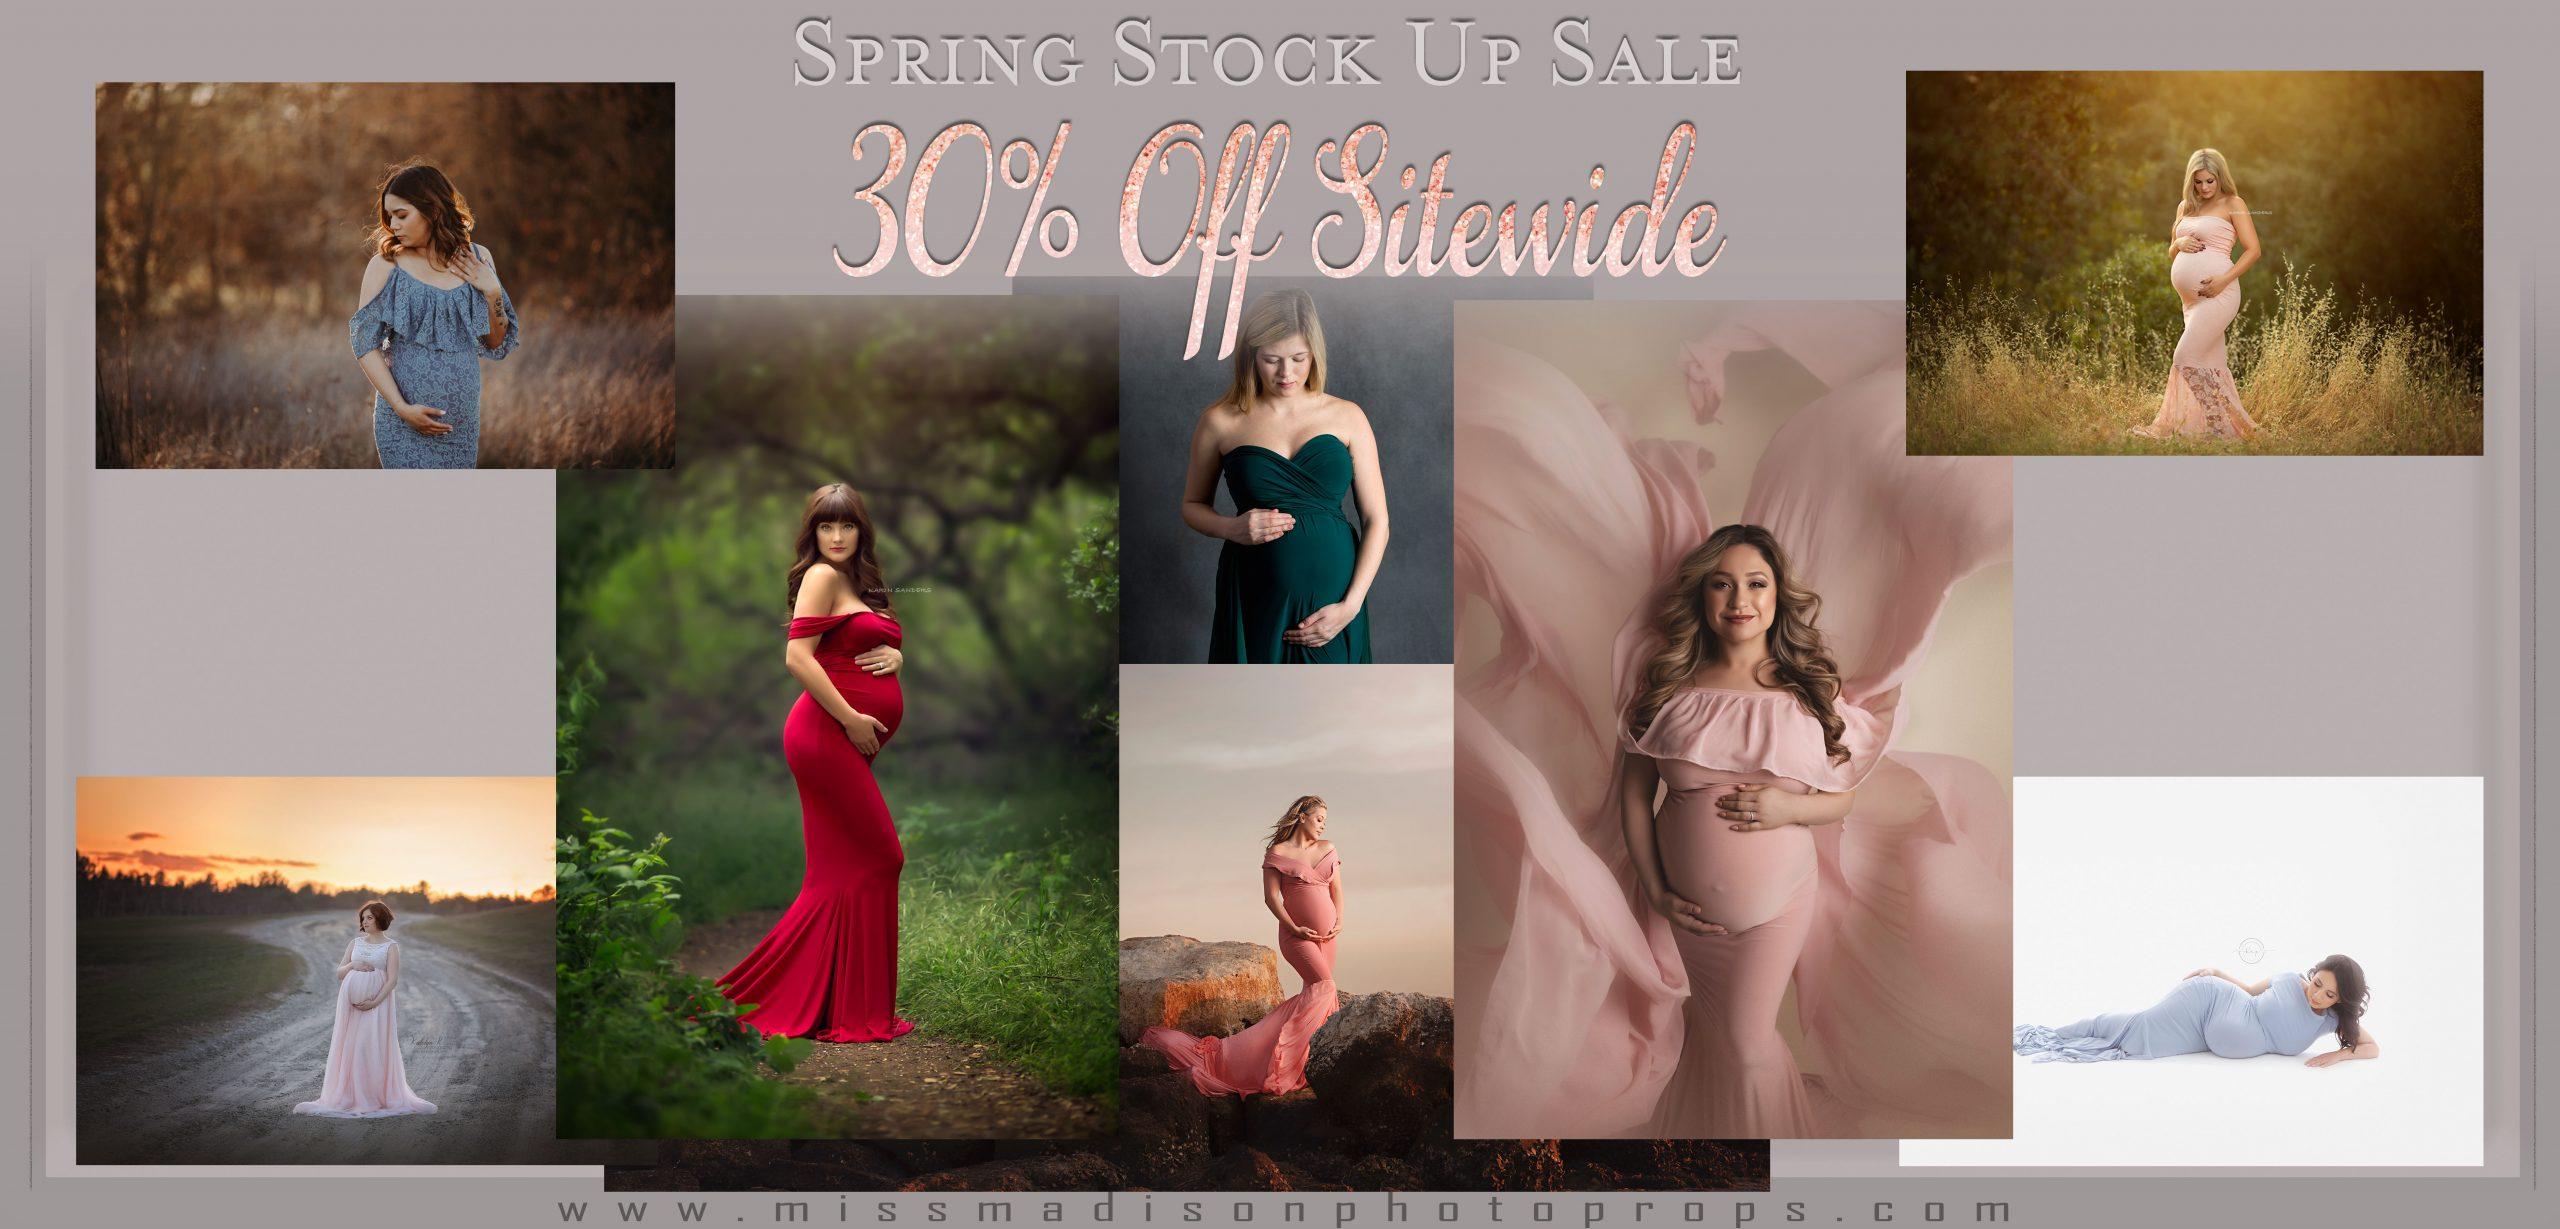 maternity dress, Maternity Gowns, maternity gowns, maternity gown, maternity dress, photography, photoshoot, babyshower dress, bridesmaid dress,